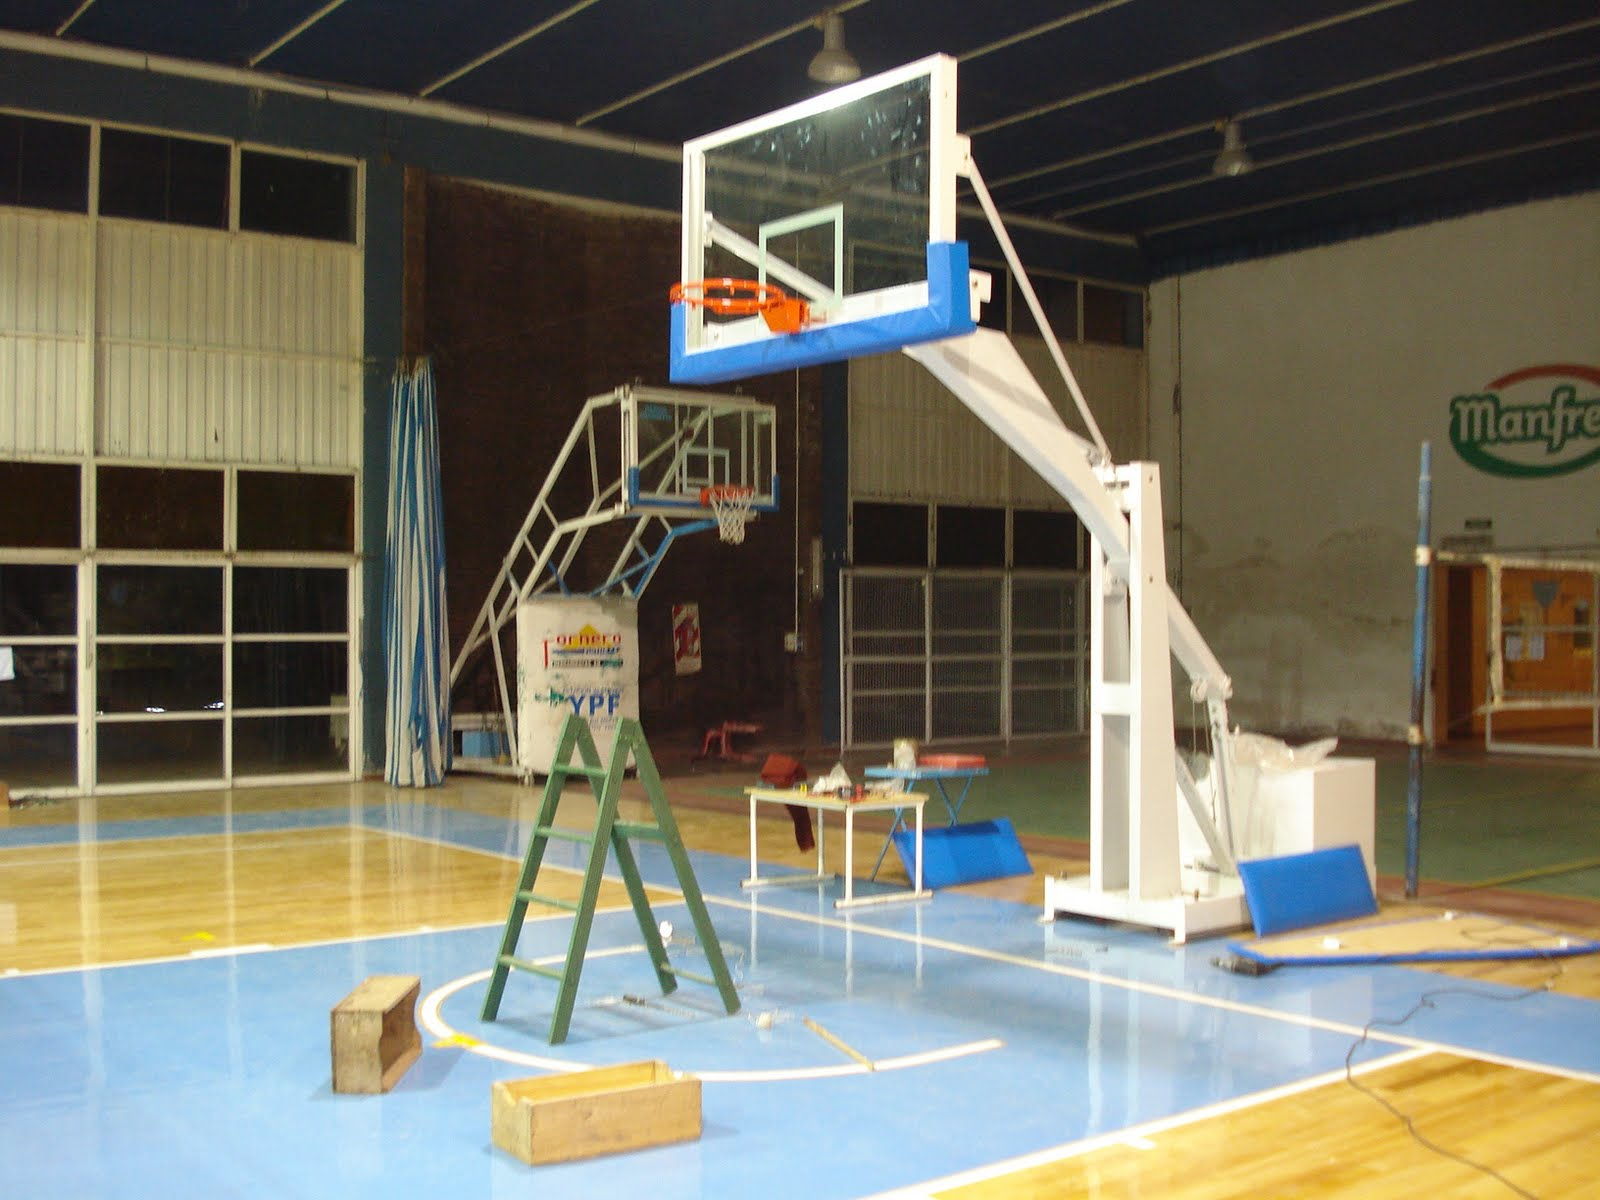 Basquet en freyre el basquet de freyre for Comedor 9 de julio freyre